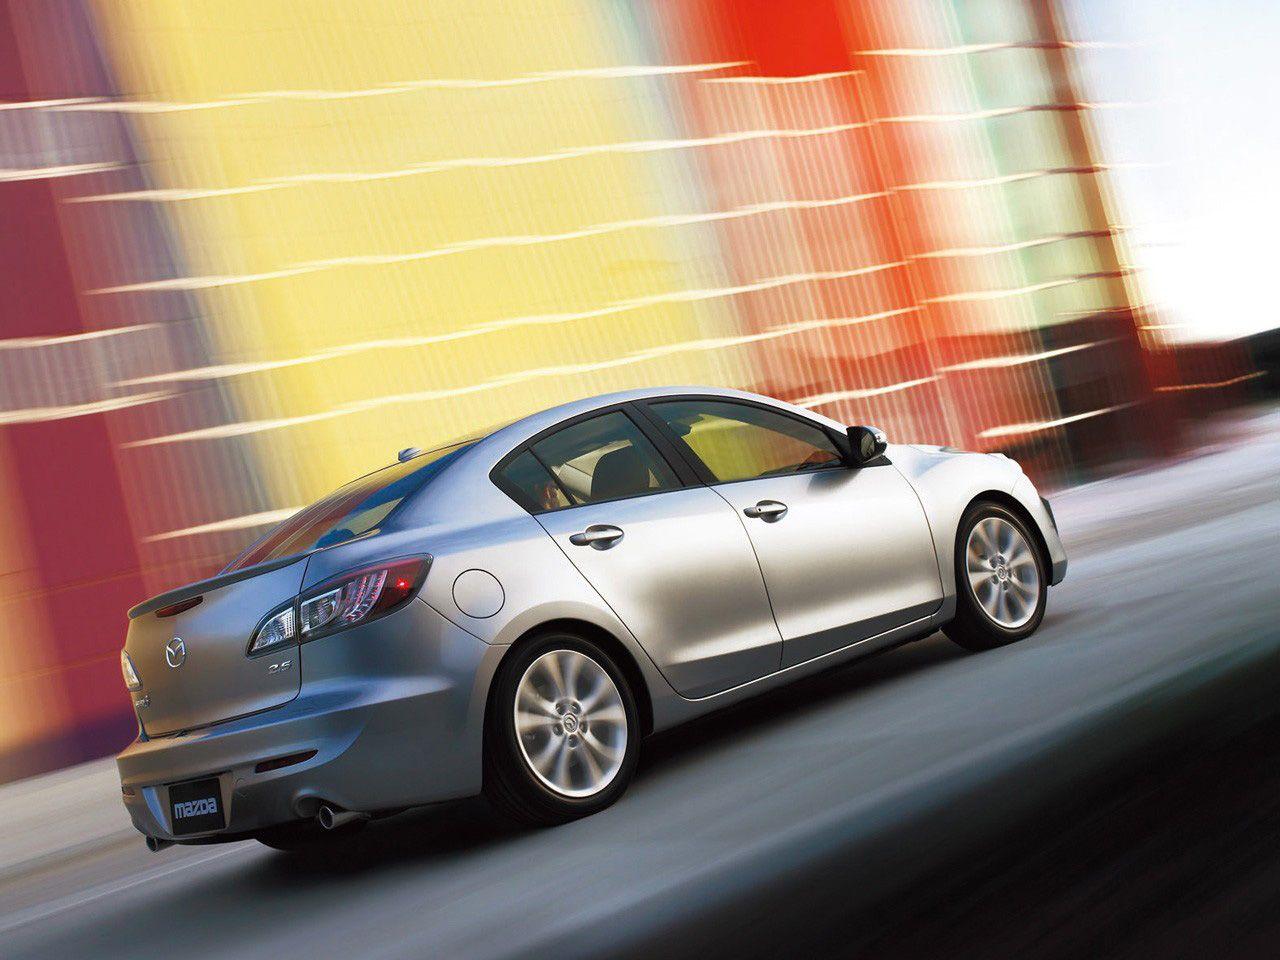 Mazda 3 Silver Side Rear Angle Moving Wallpaper 1280x960